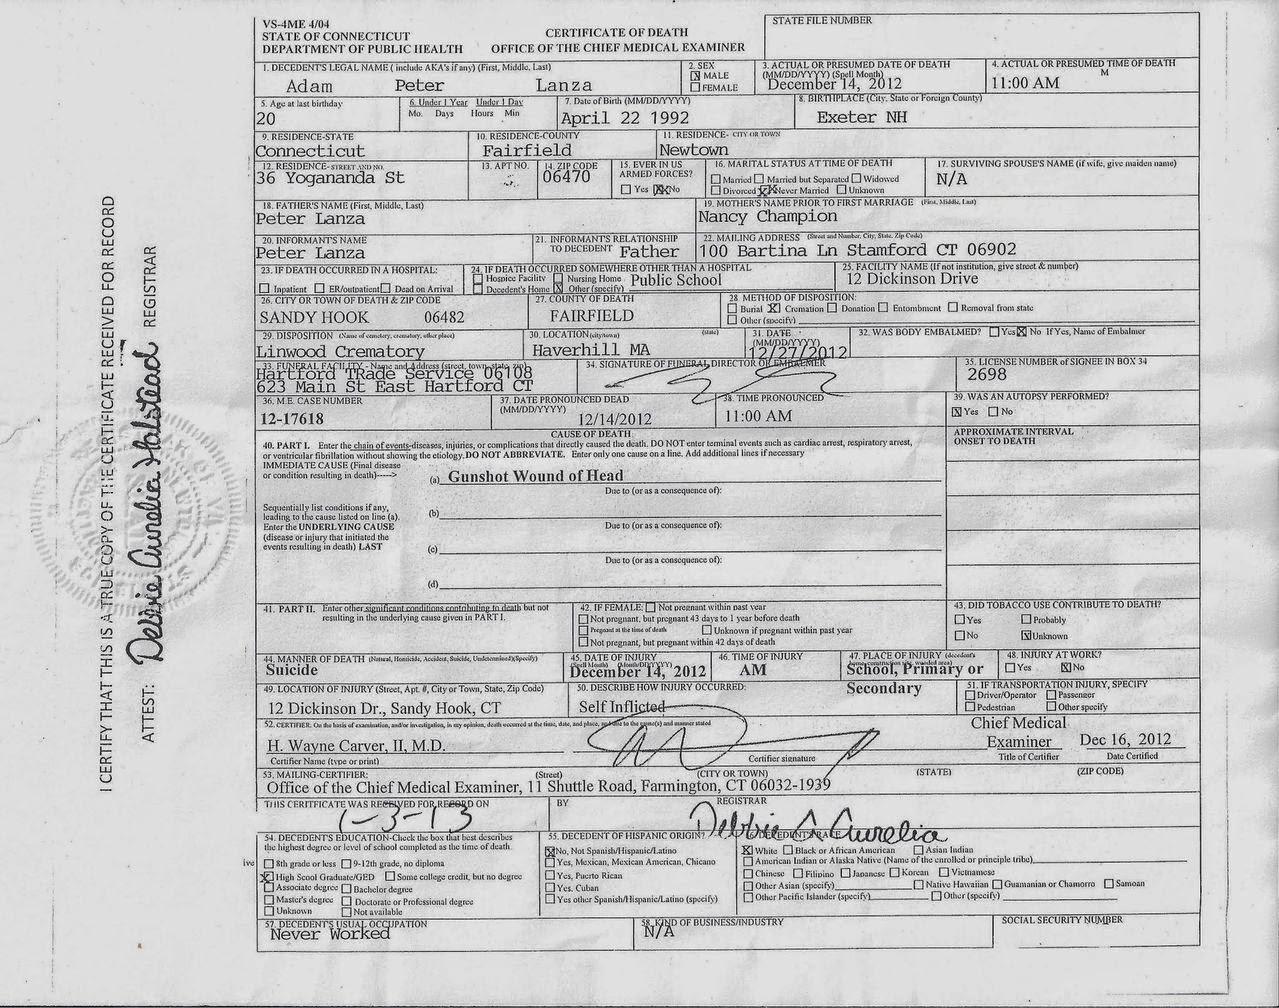 Sandy Hook- Facts & Research: Adam Lanza Death Certificate